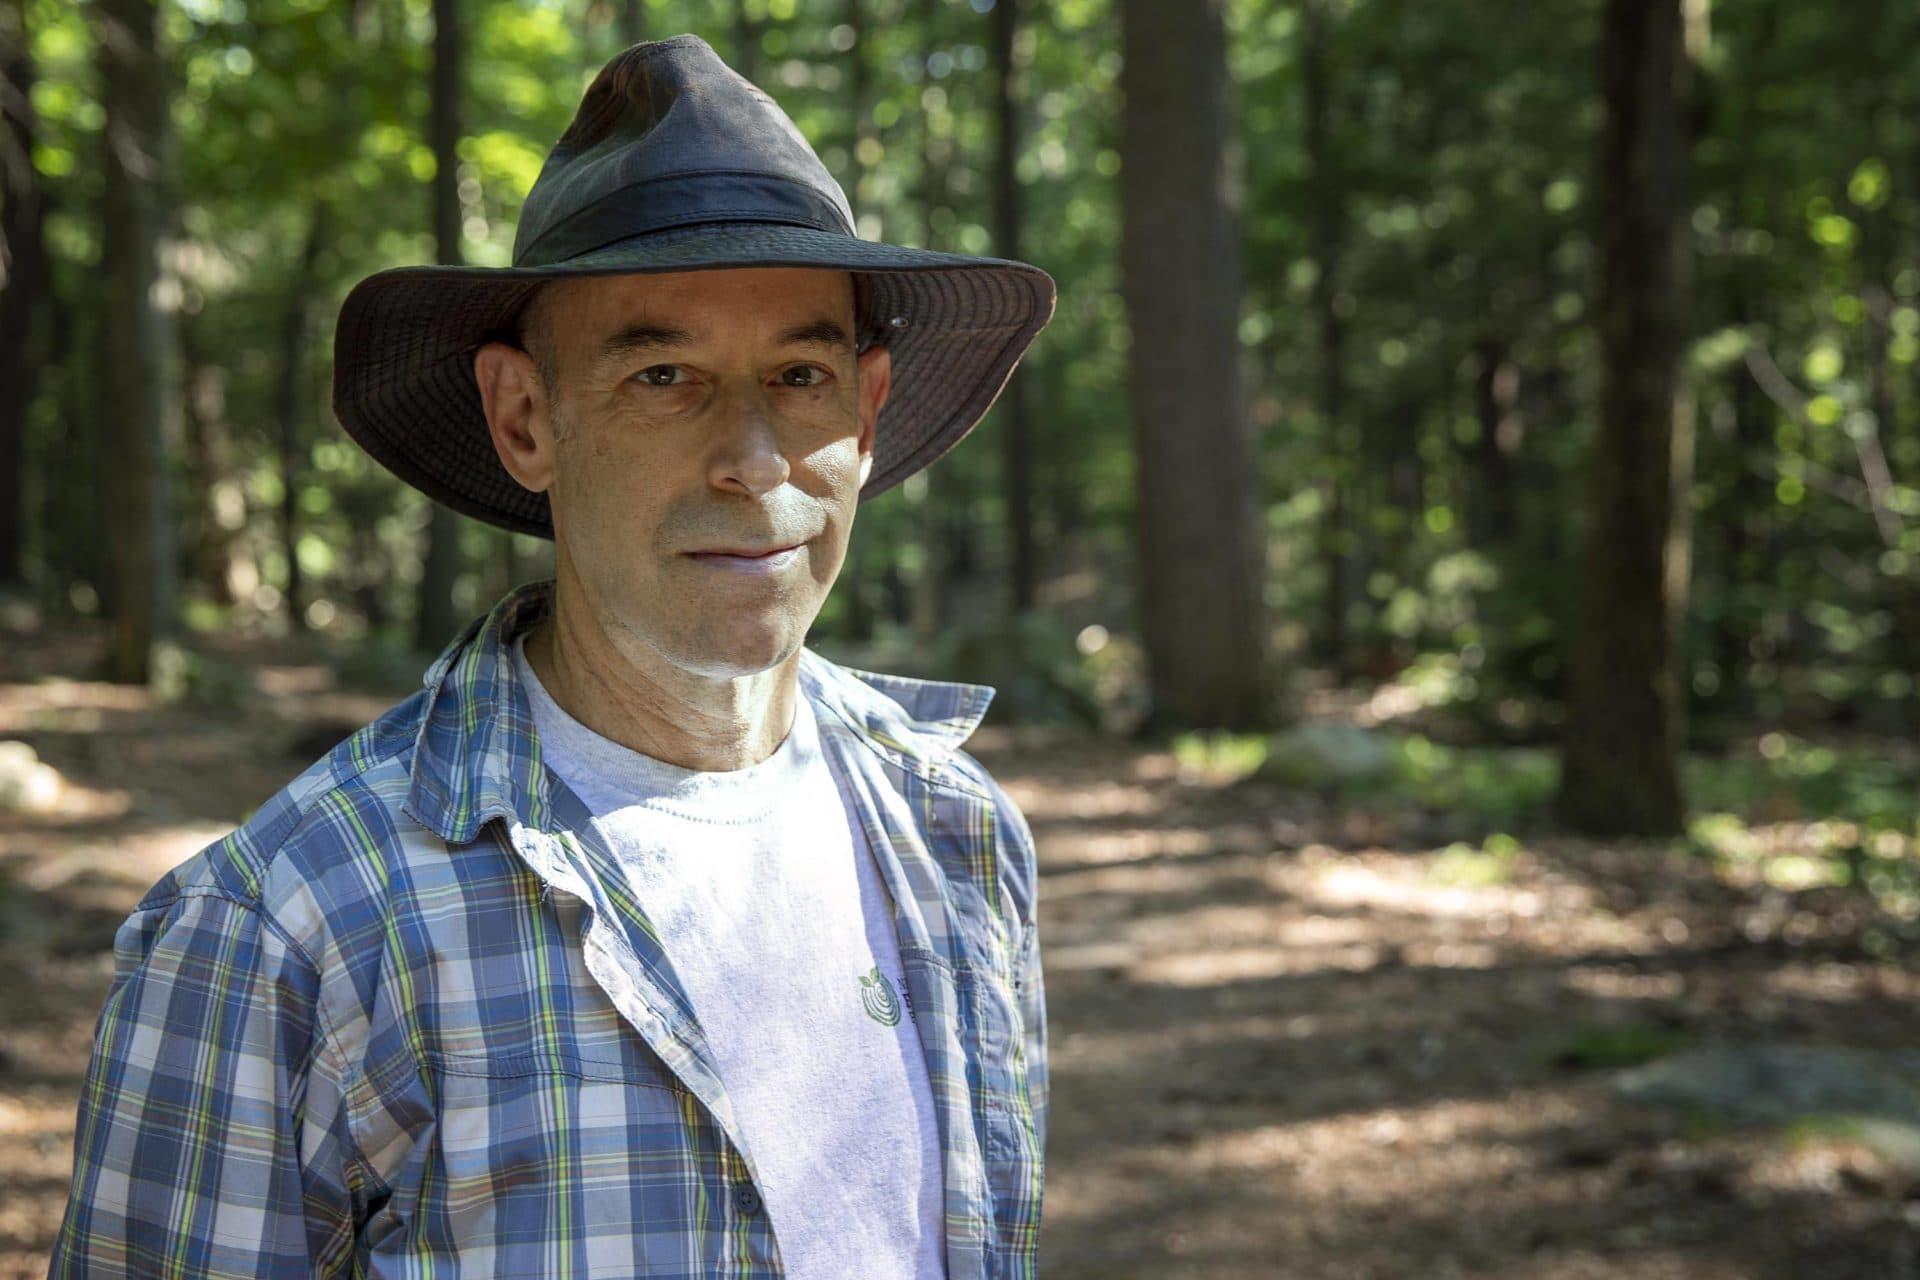 Frank Lowenstein, deputy director of the New England Forestry Foundation. (Robin Lubbock/WBUR)